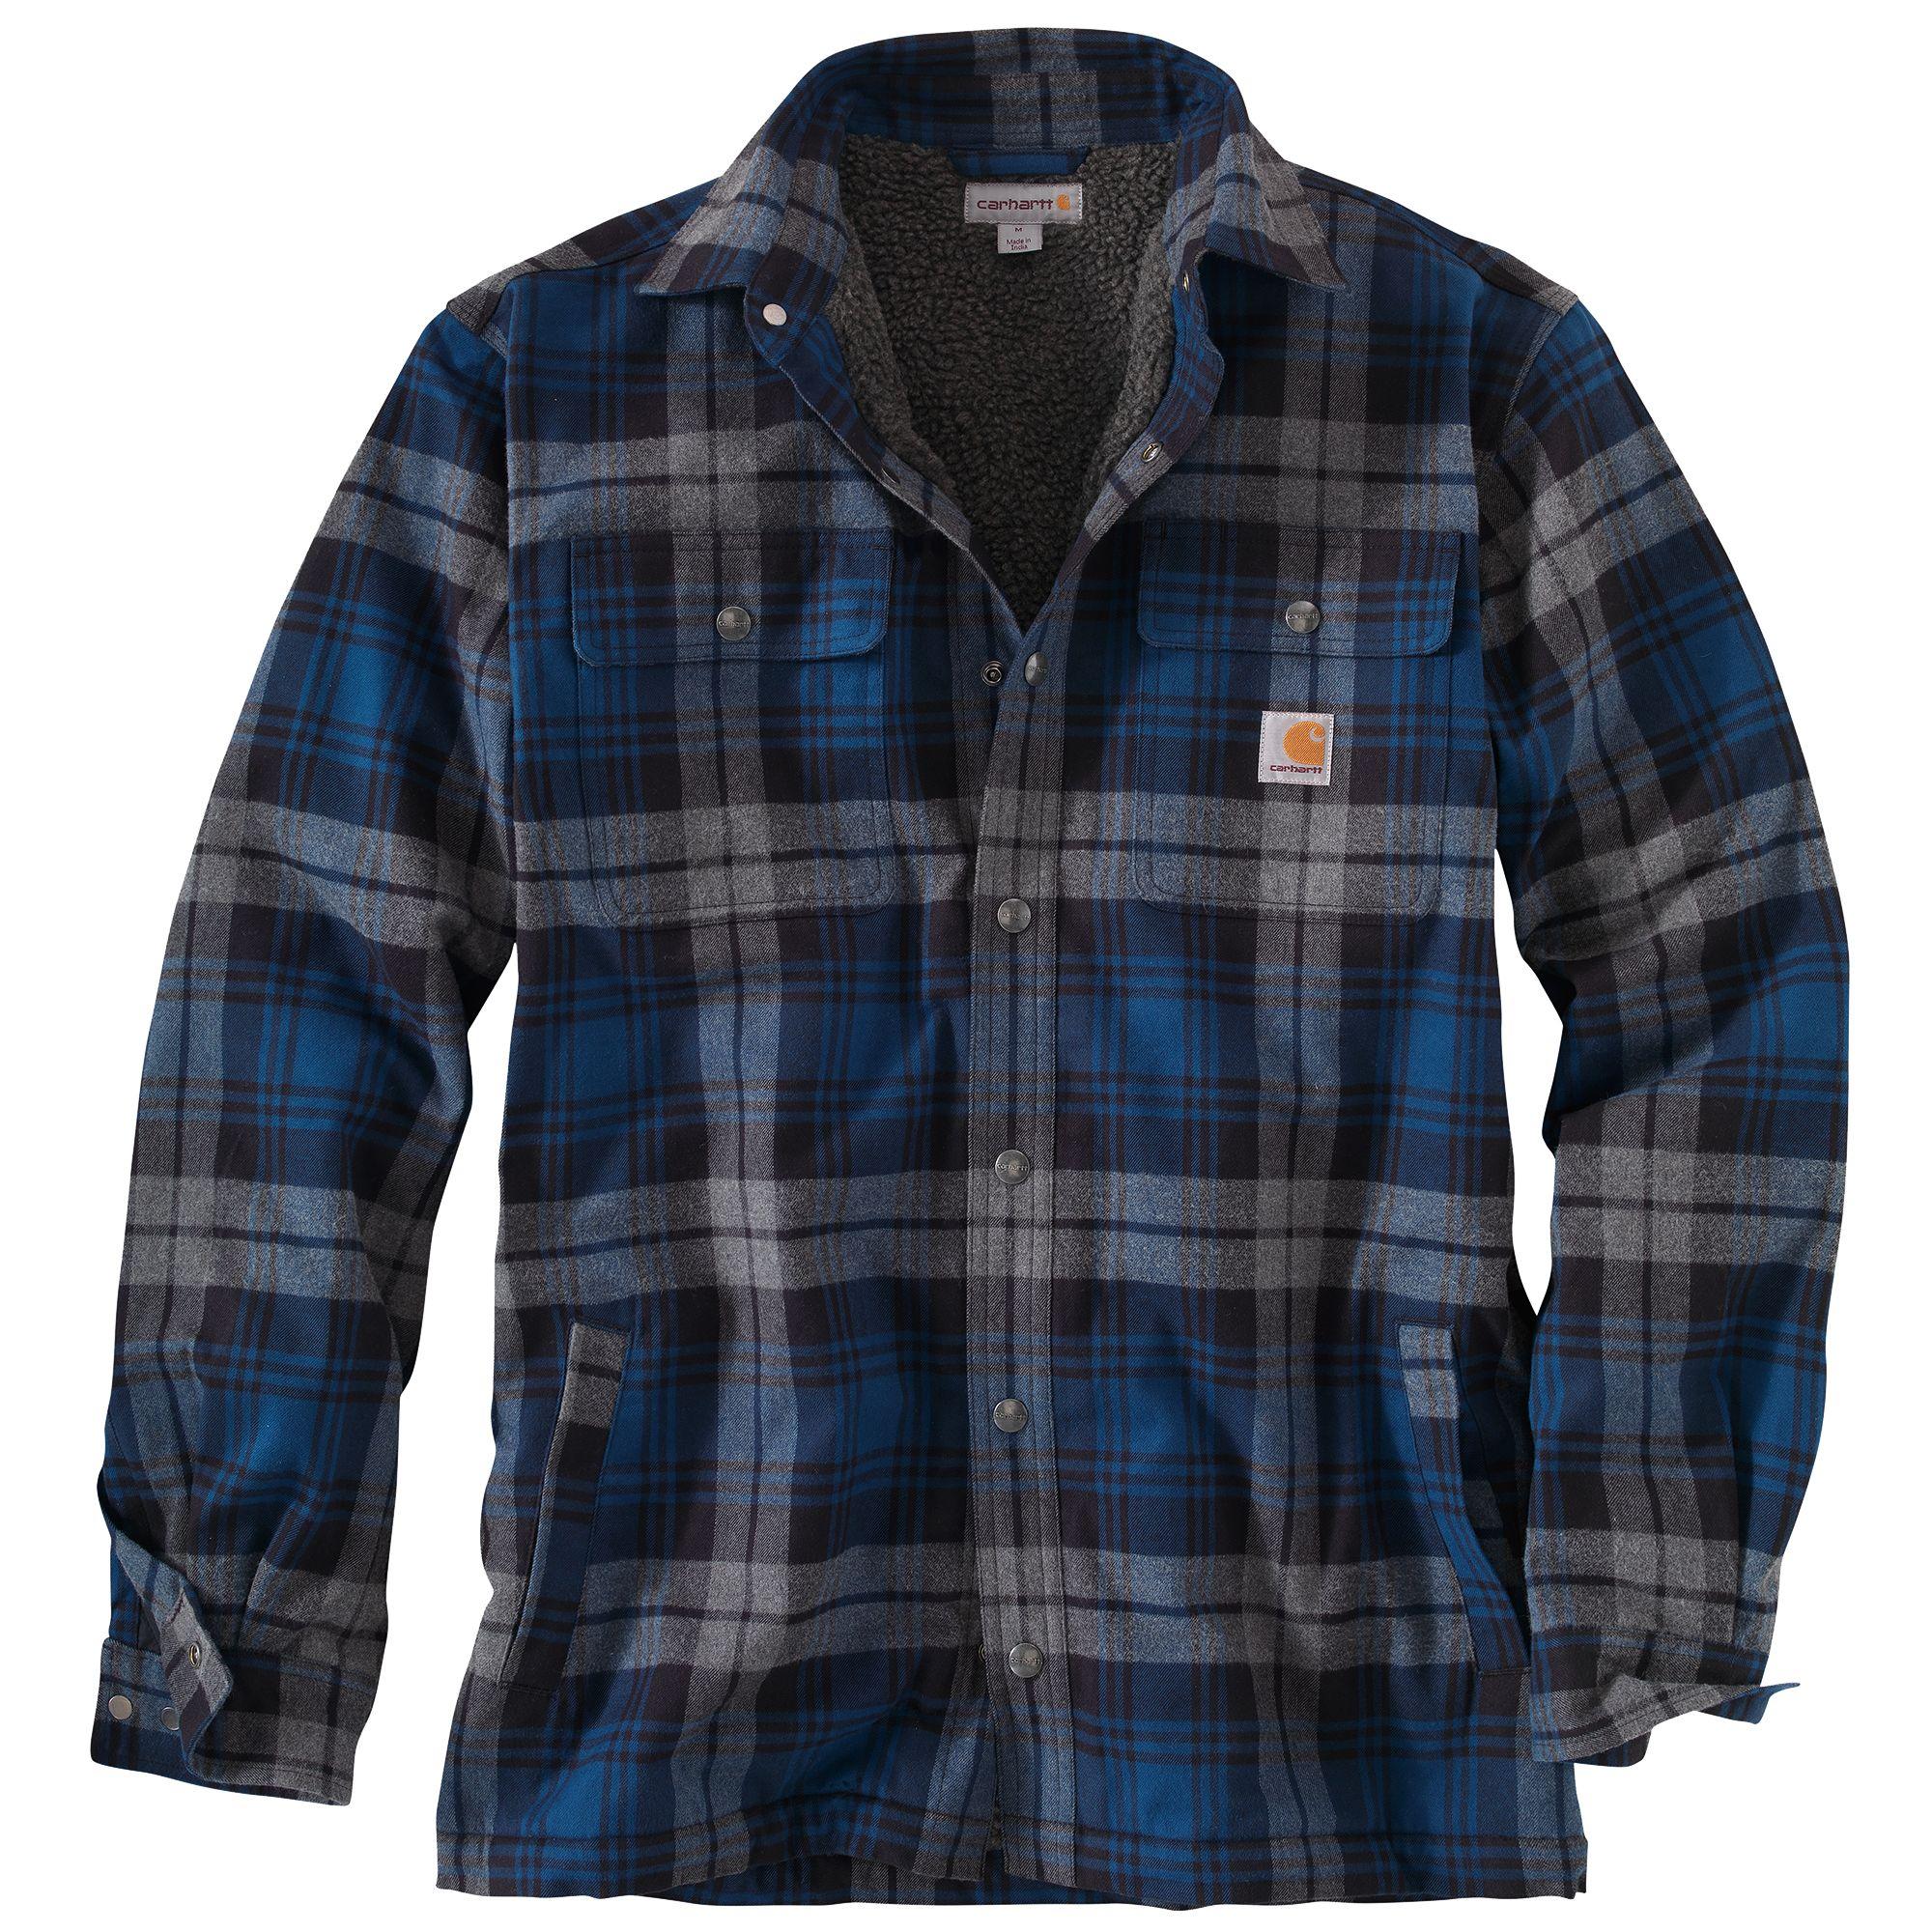 Carhartt Men's Hubbard Sherpa-Lined Shirt Jacket | Field & Stream